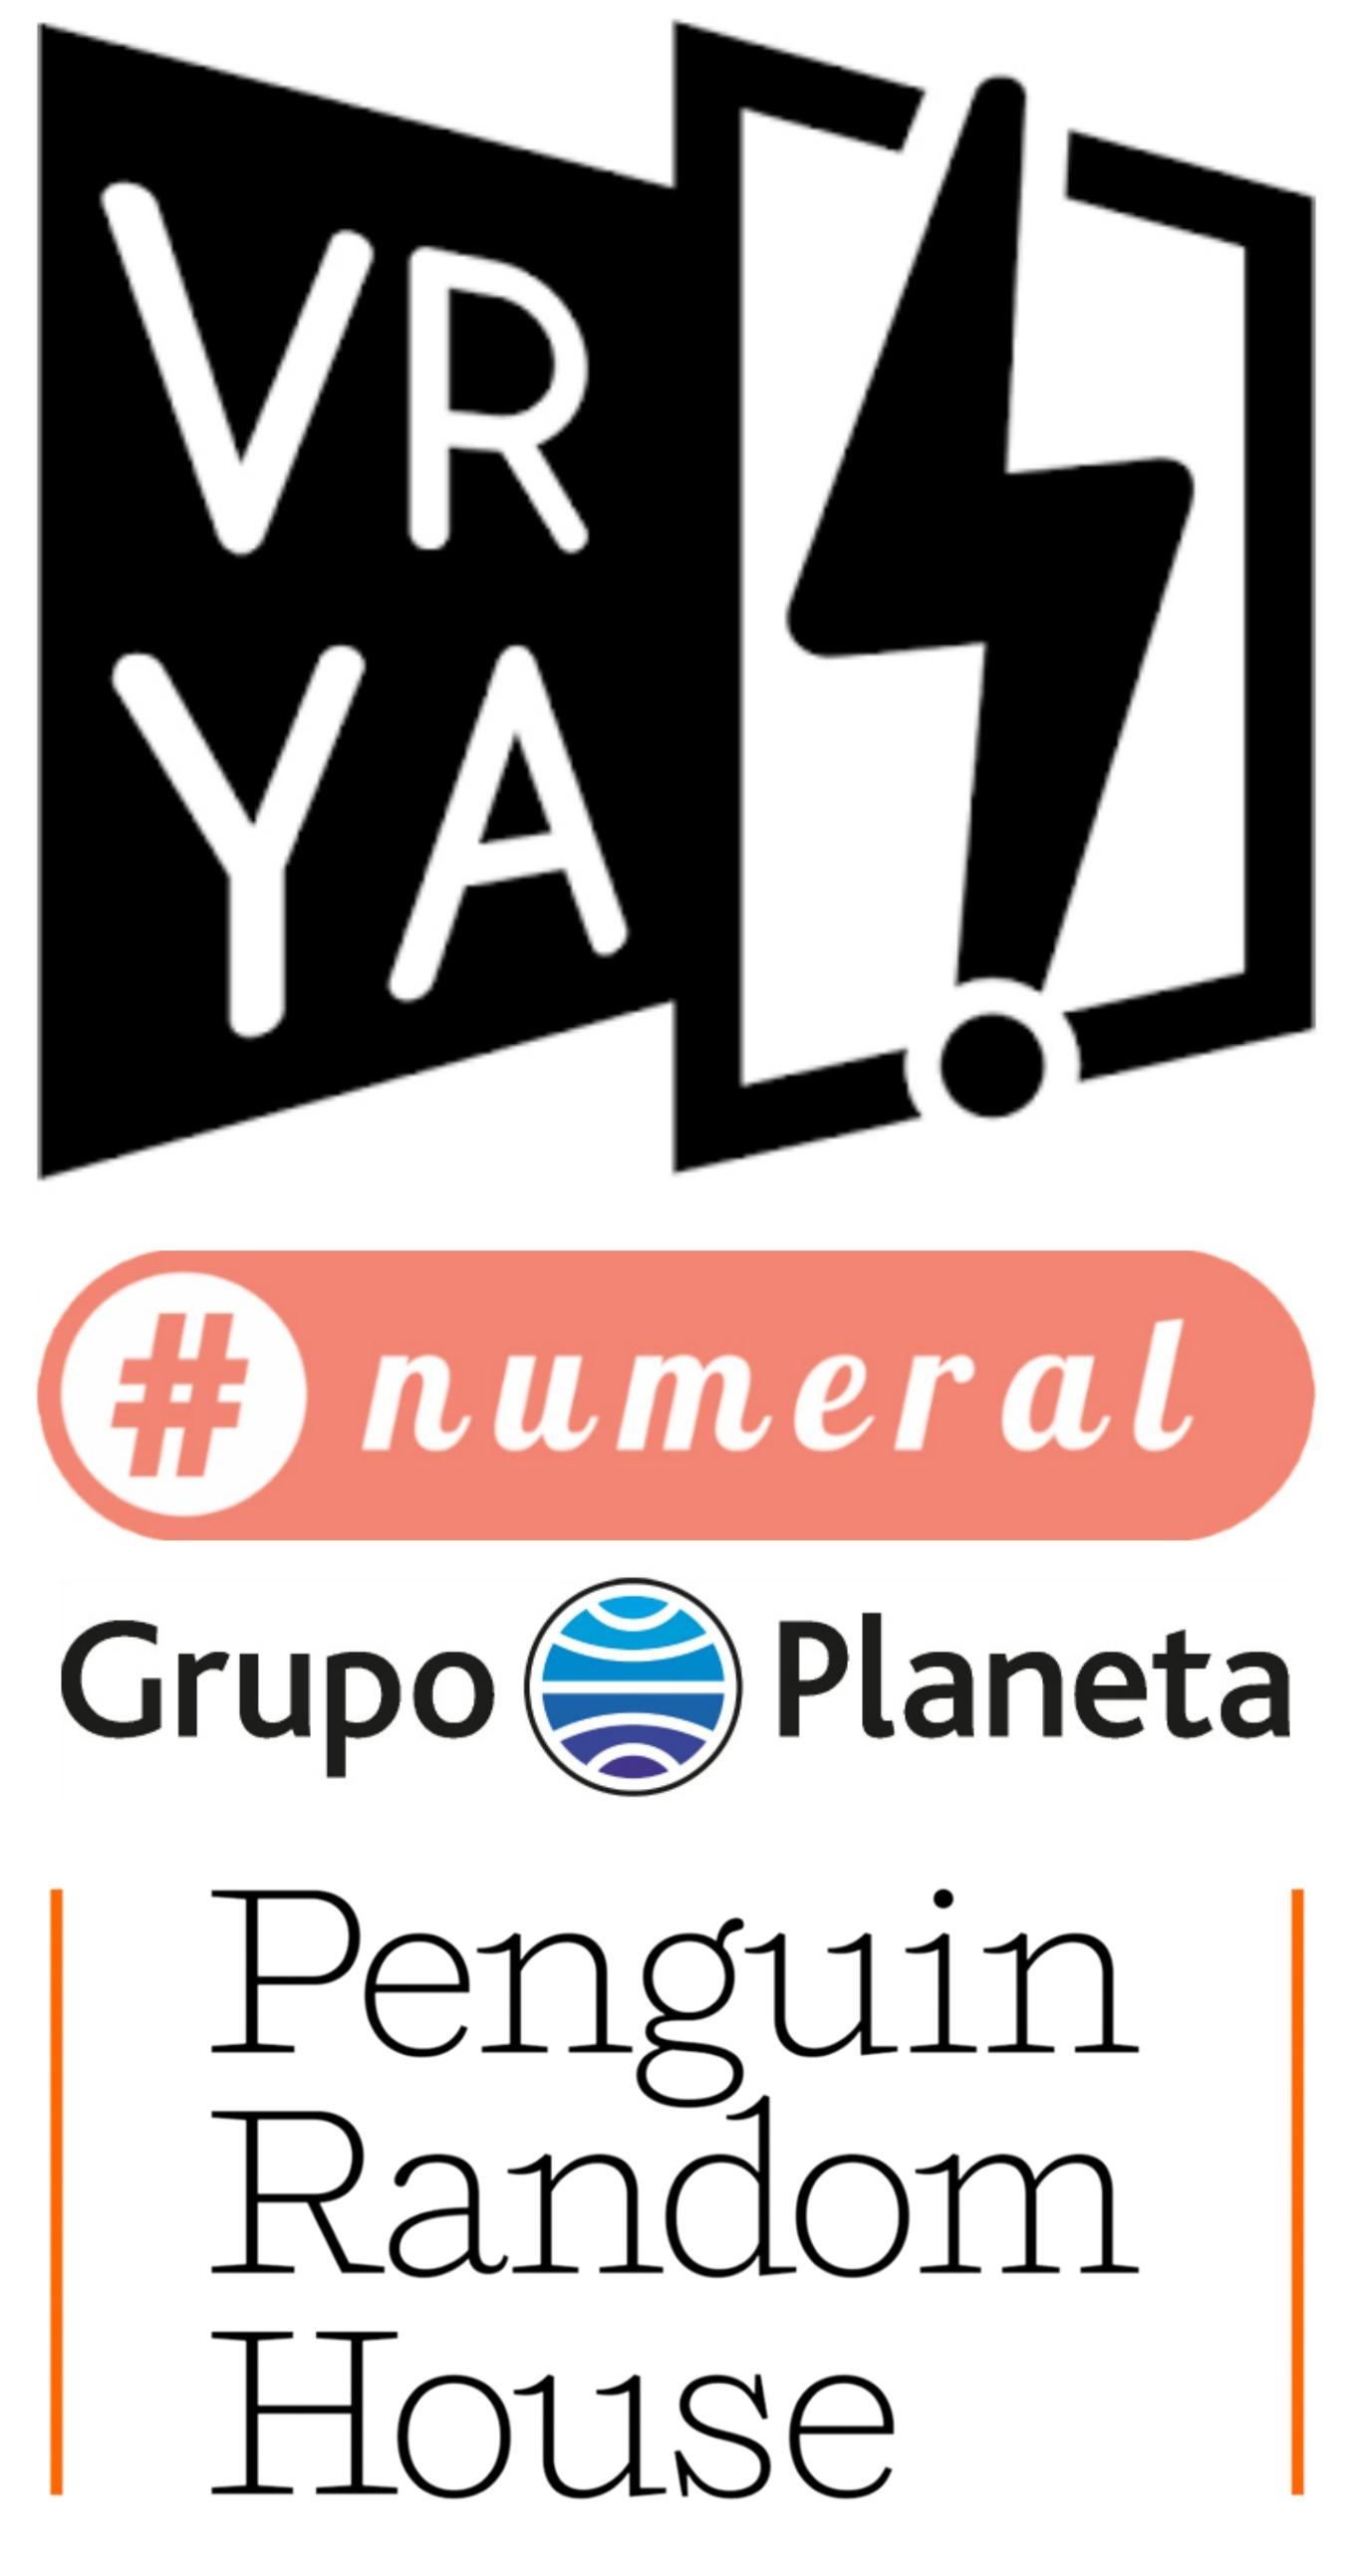 Gracias VRYA, #numeral, Planeta y PRH